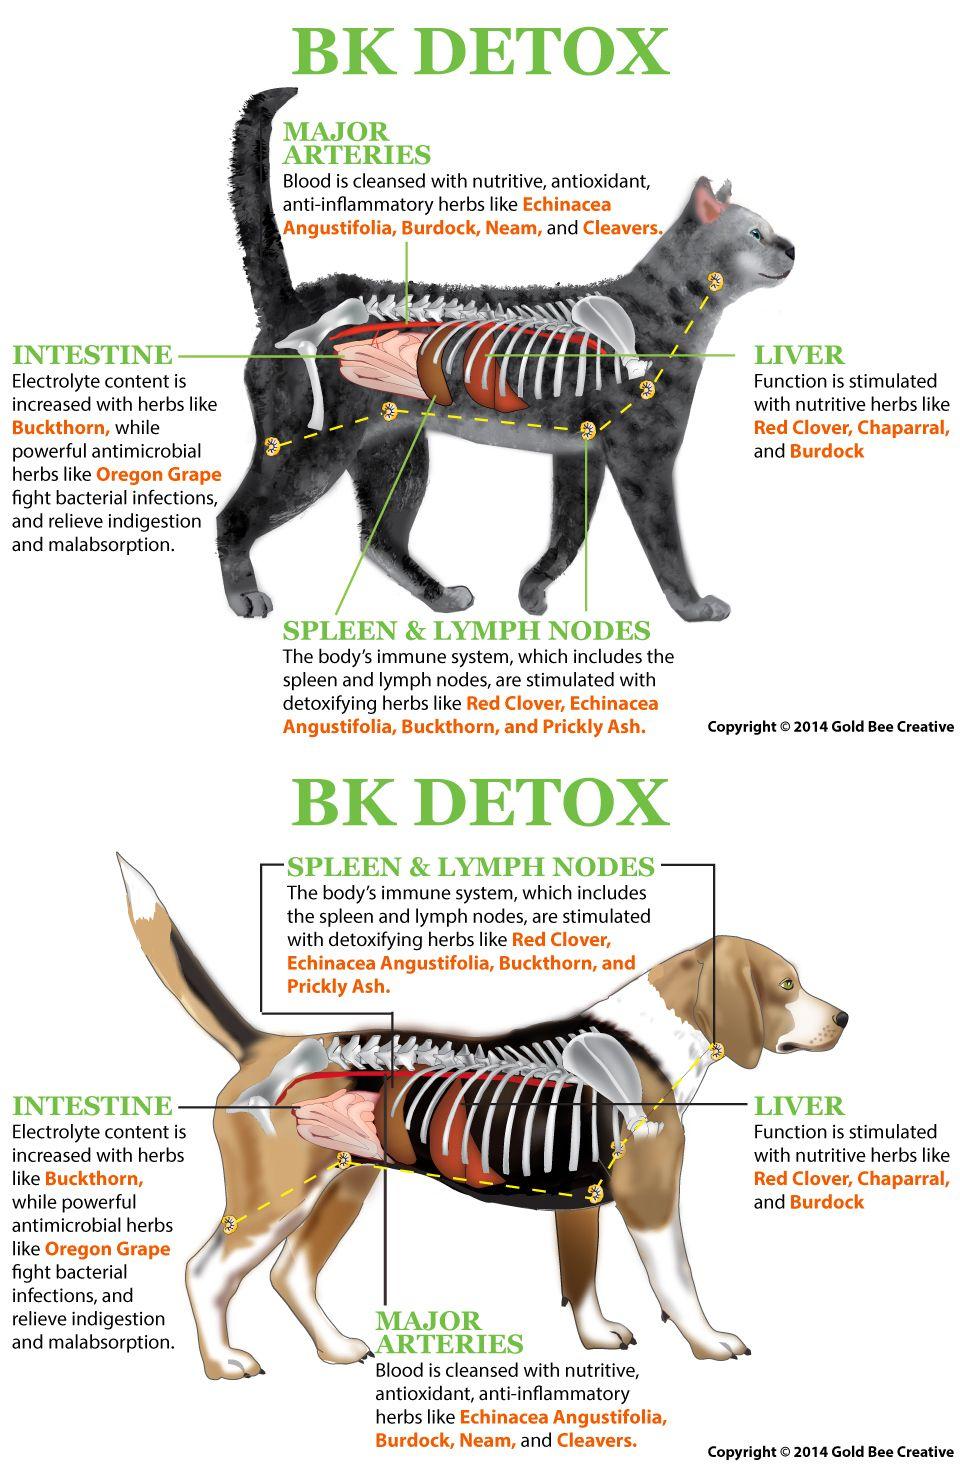 BK Detox for dogs   Diabetic dog, Dogs, Dog cancer